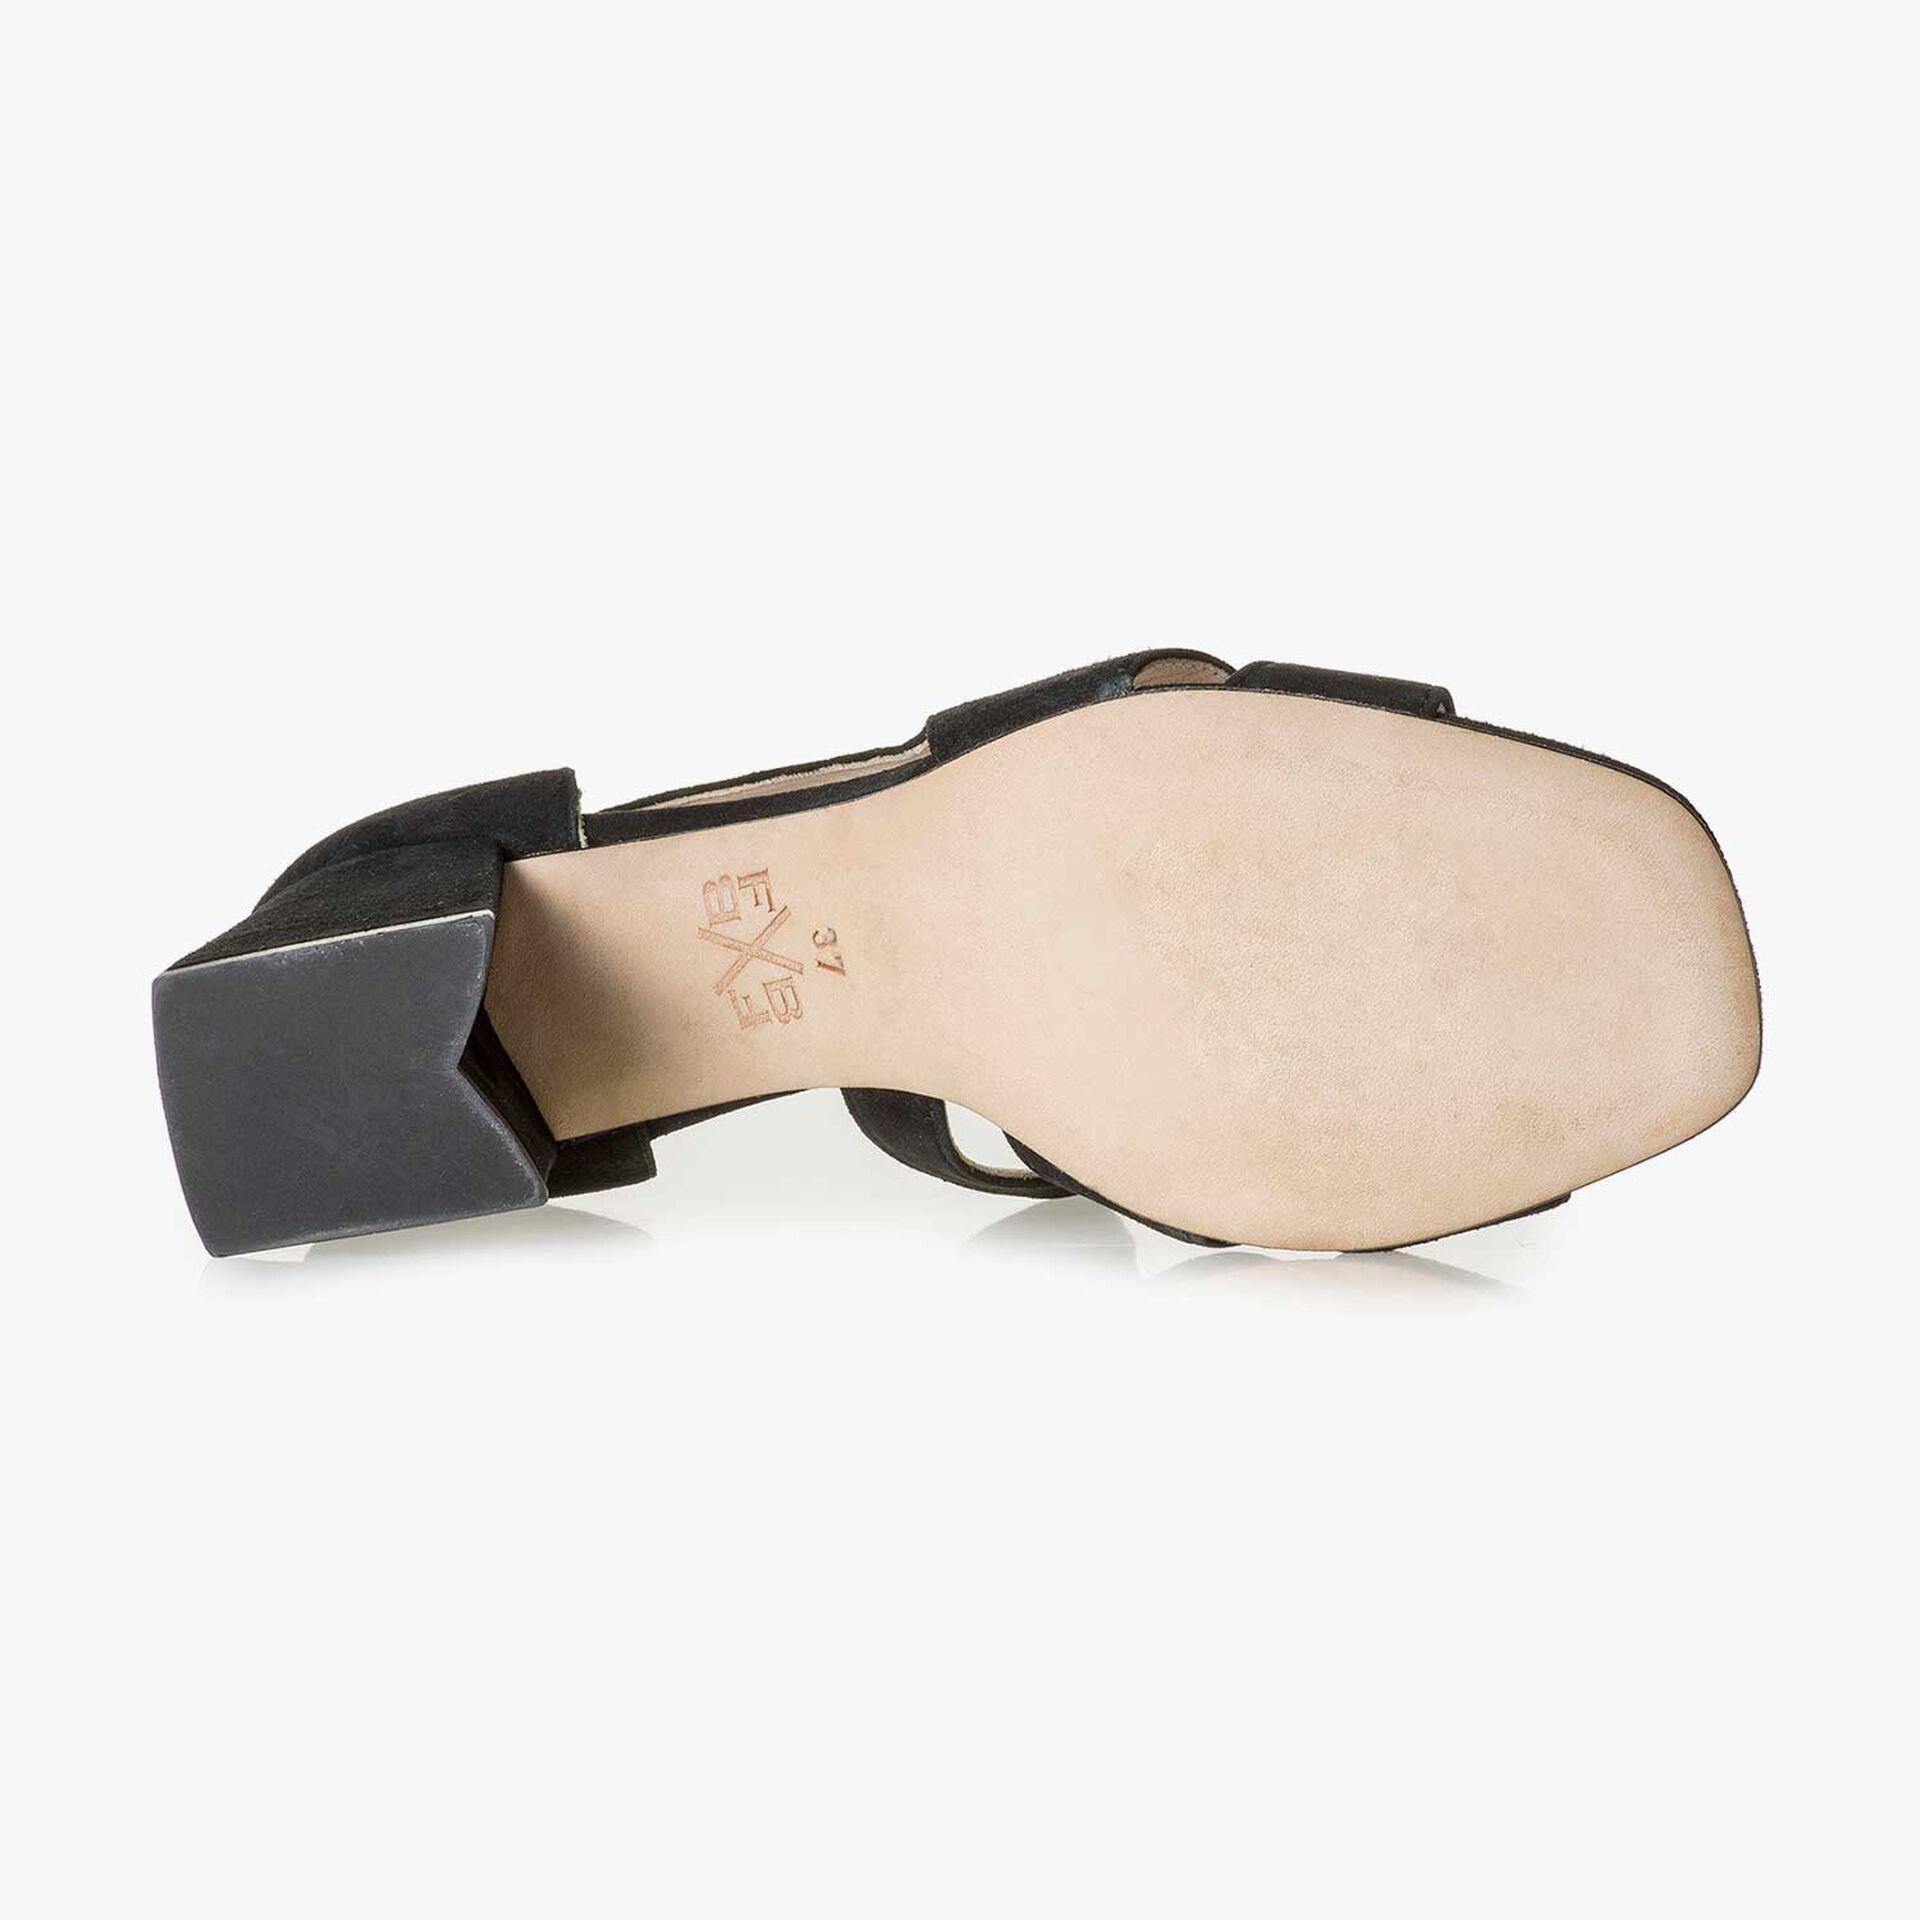 Black high-heeled suede leather sandal